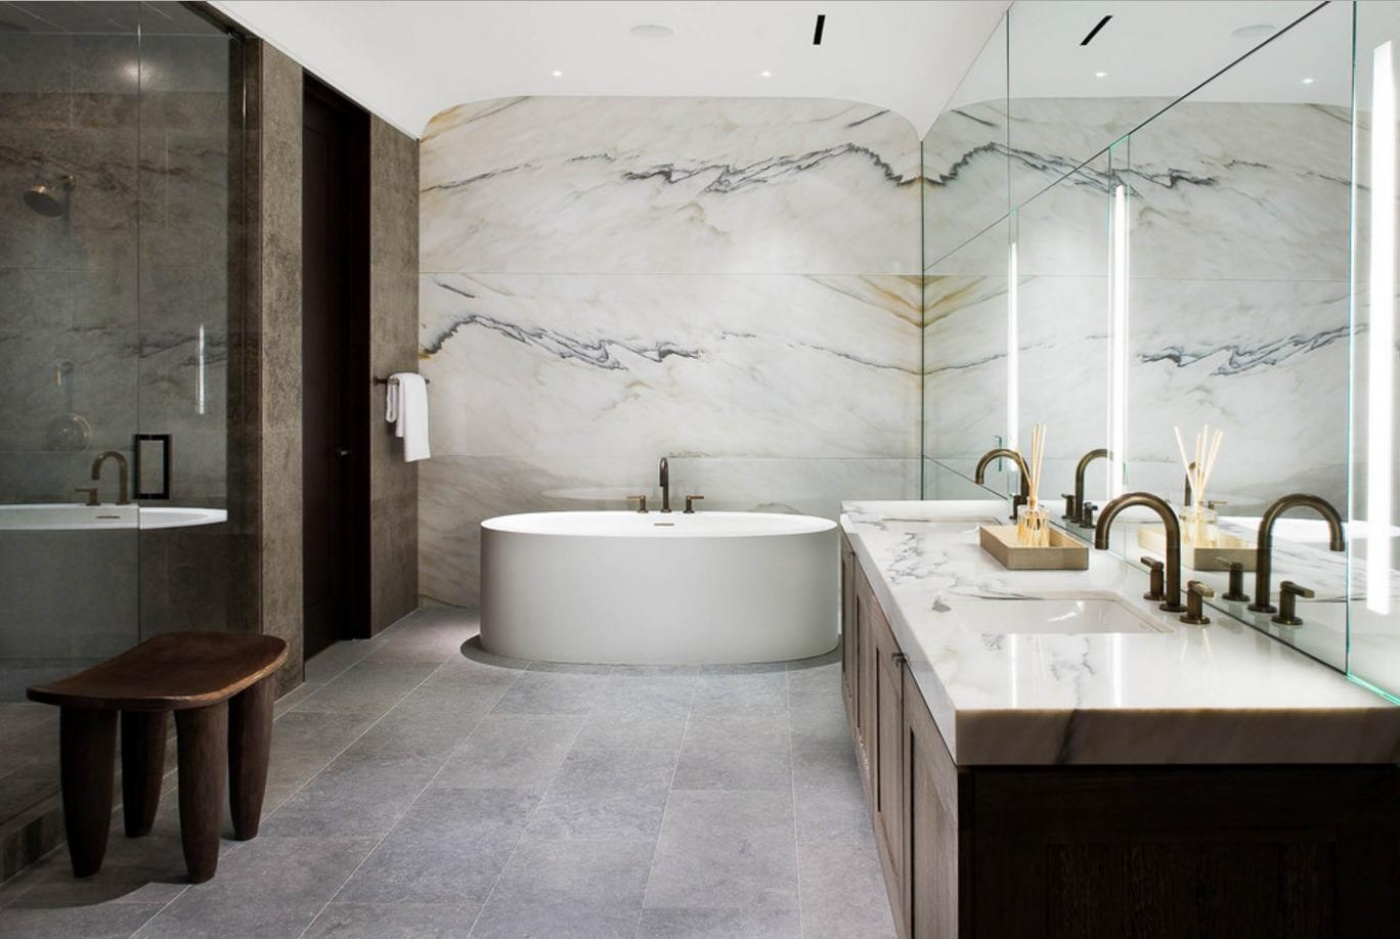 Salle de bains Marbre blanc Paonazetto Calacatta - Marbrerie de La ...